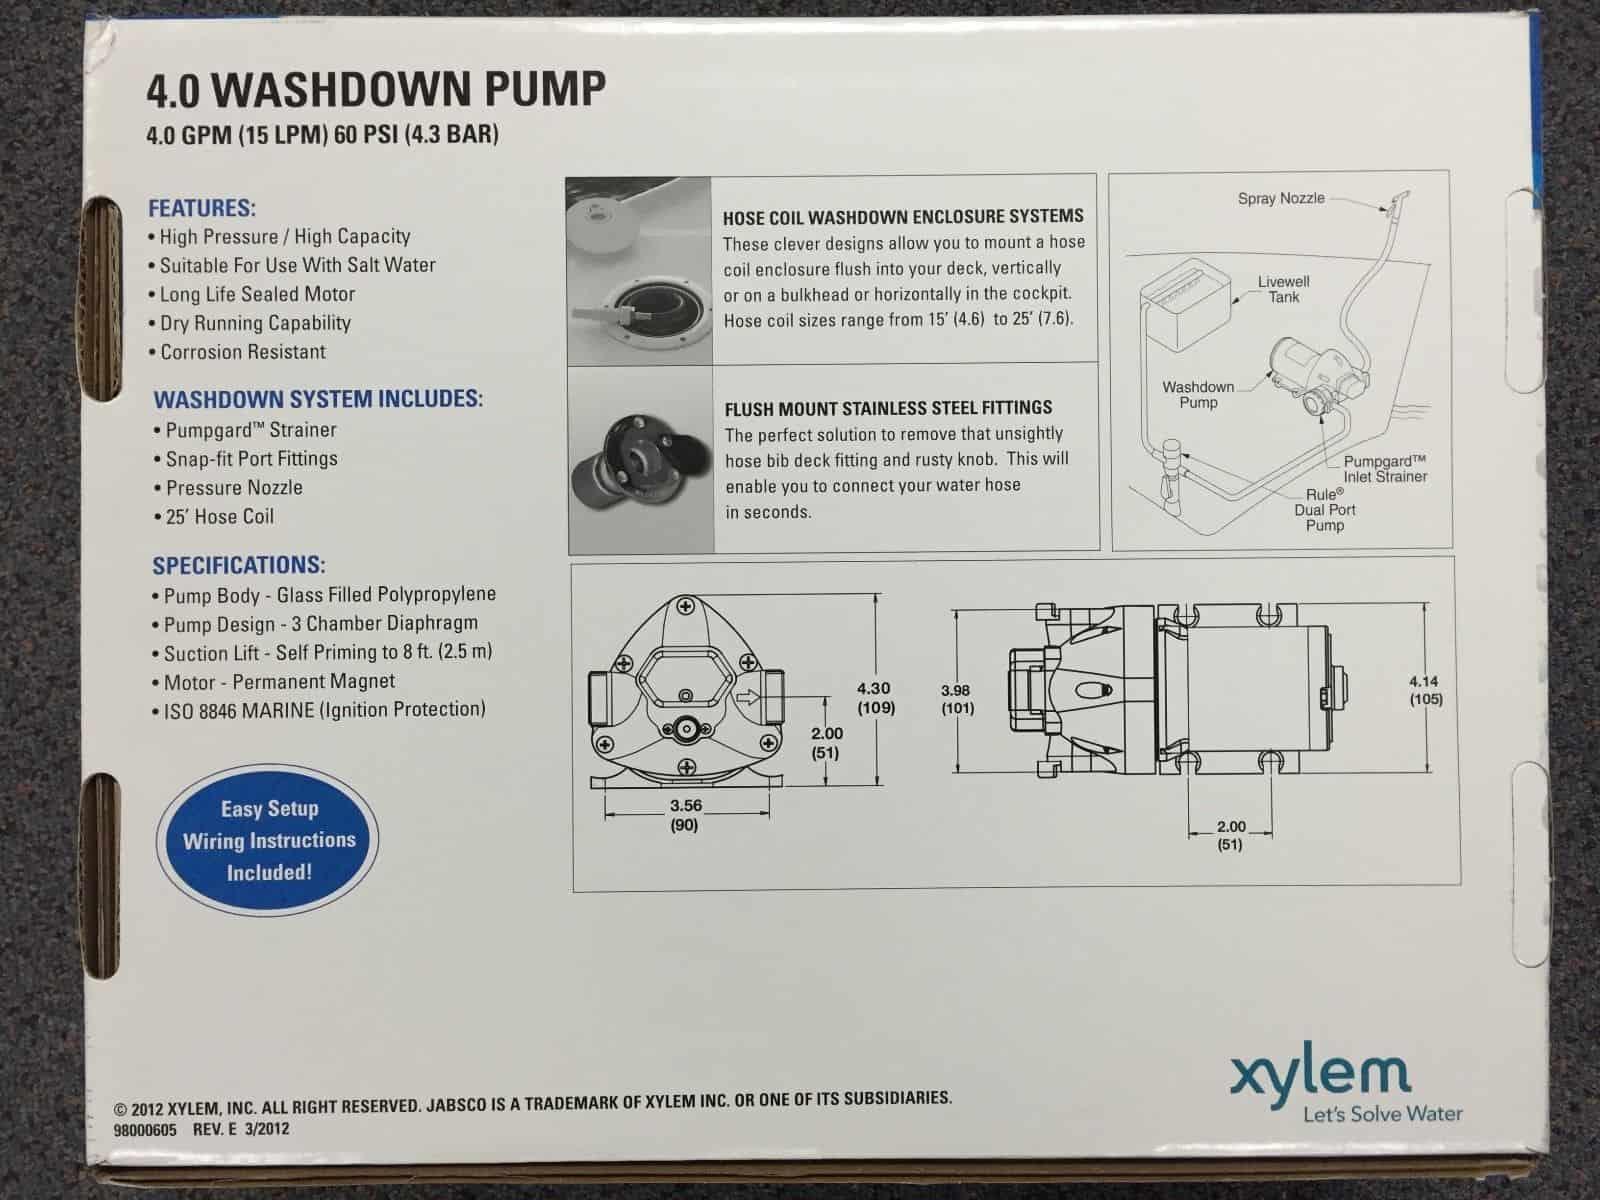 lb_3397] jabsco pressure pump wiring diagrams free diagram  cran tool unre bedr nful gho vira mohammedshrine librar wiring 101